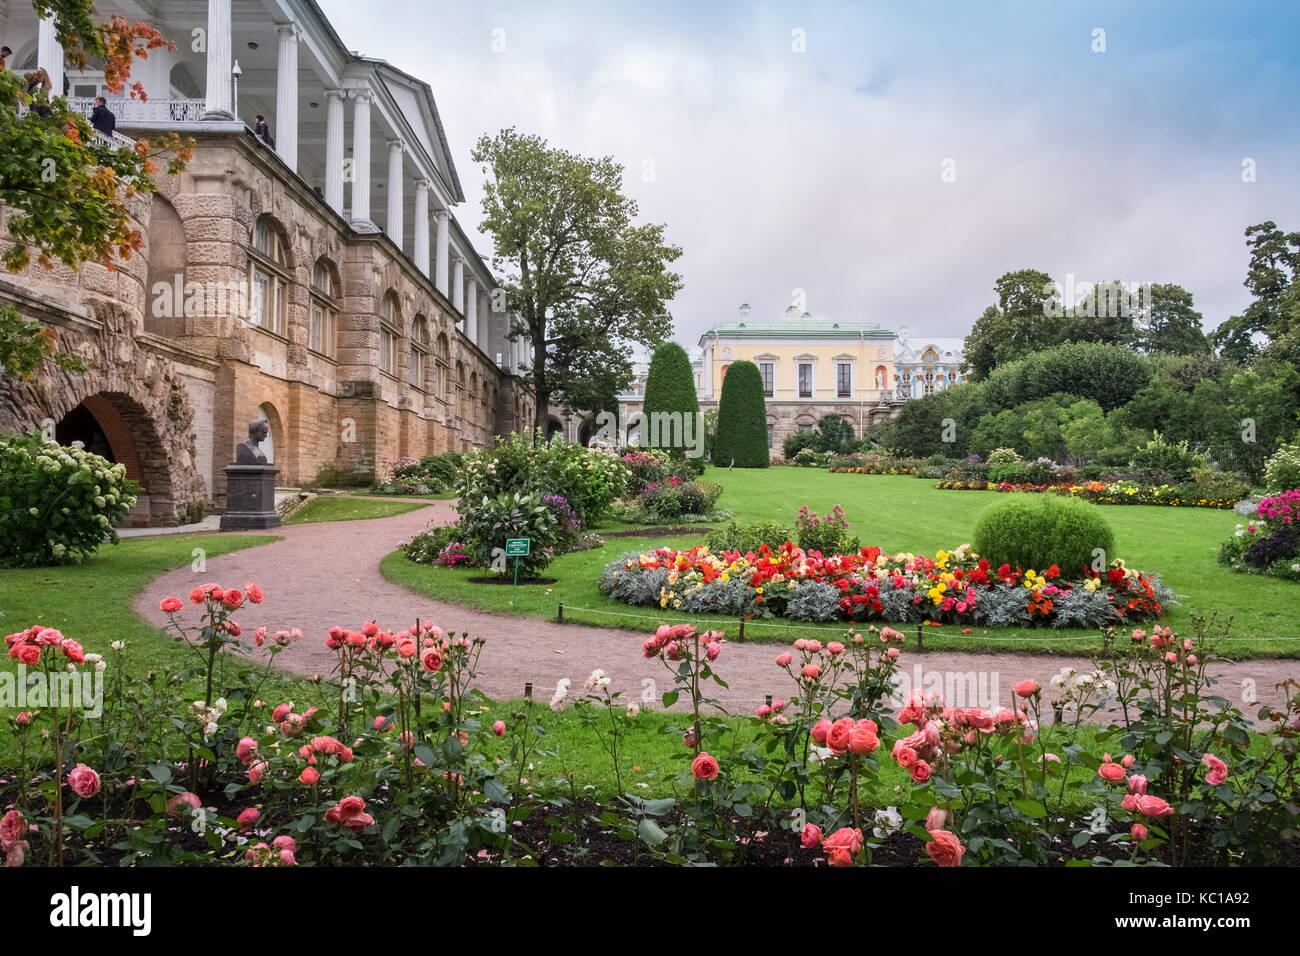 Palace gardens, Catherine Palace (Tsarskoe Selo), Pushkin, St. Petersburg, Russia - Stock Image